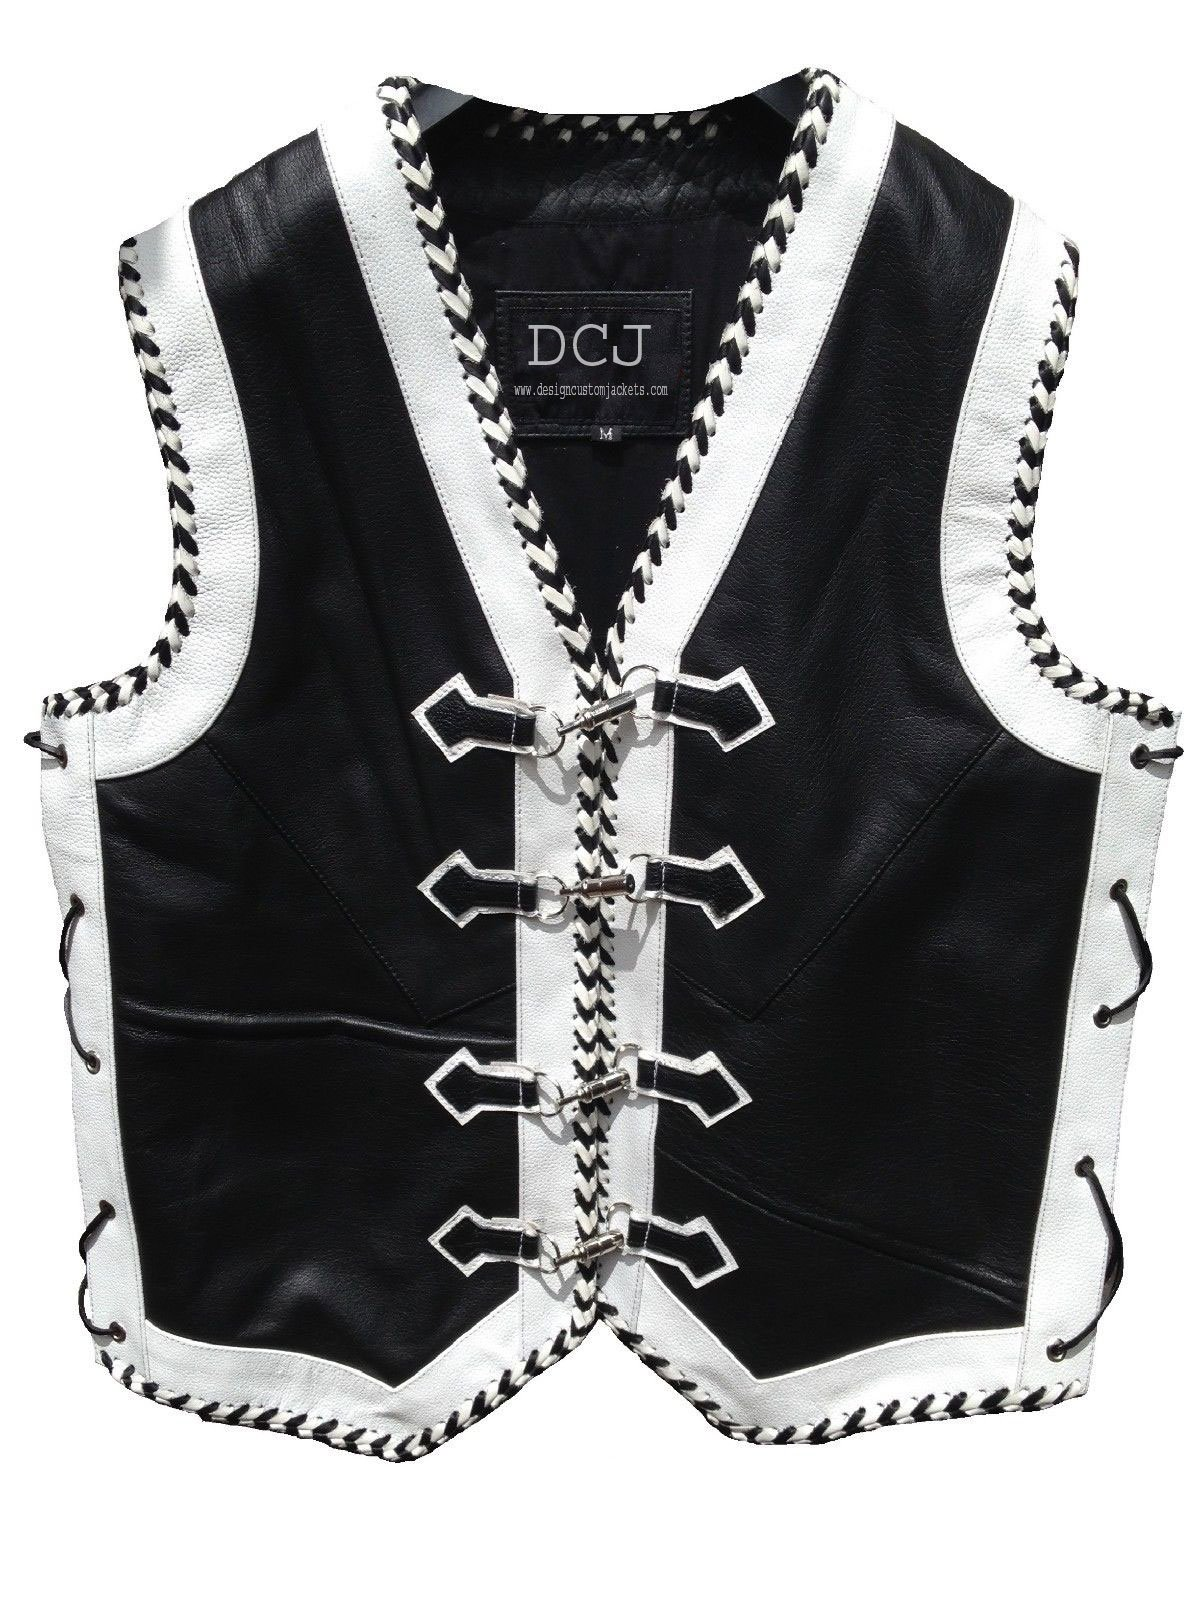 Leather Motorcycle Vest Custom Motorbike Biker Rider Waistcoat Hand Braided (XXL) by Design Custom Jackets